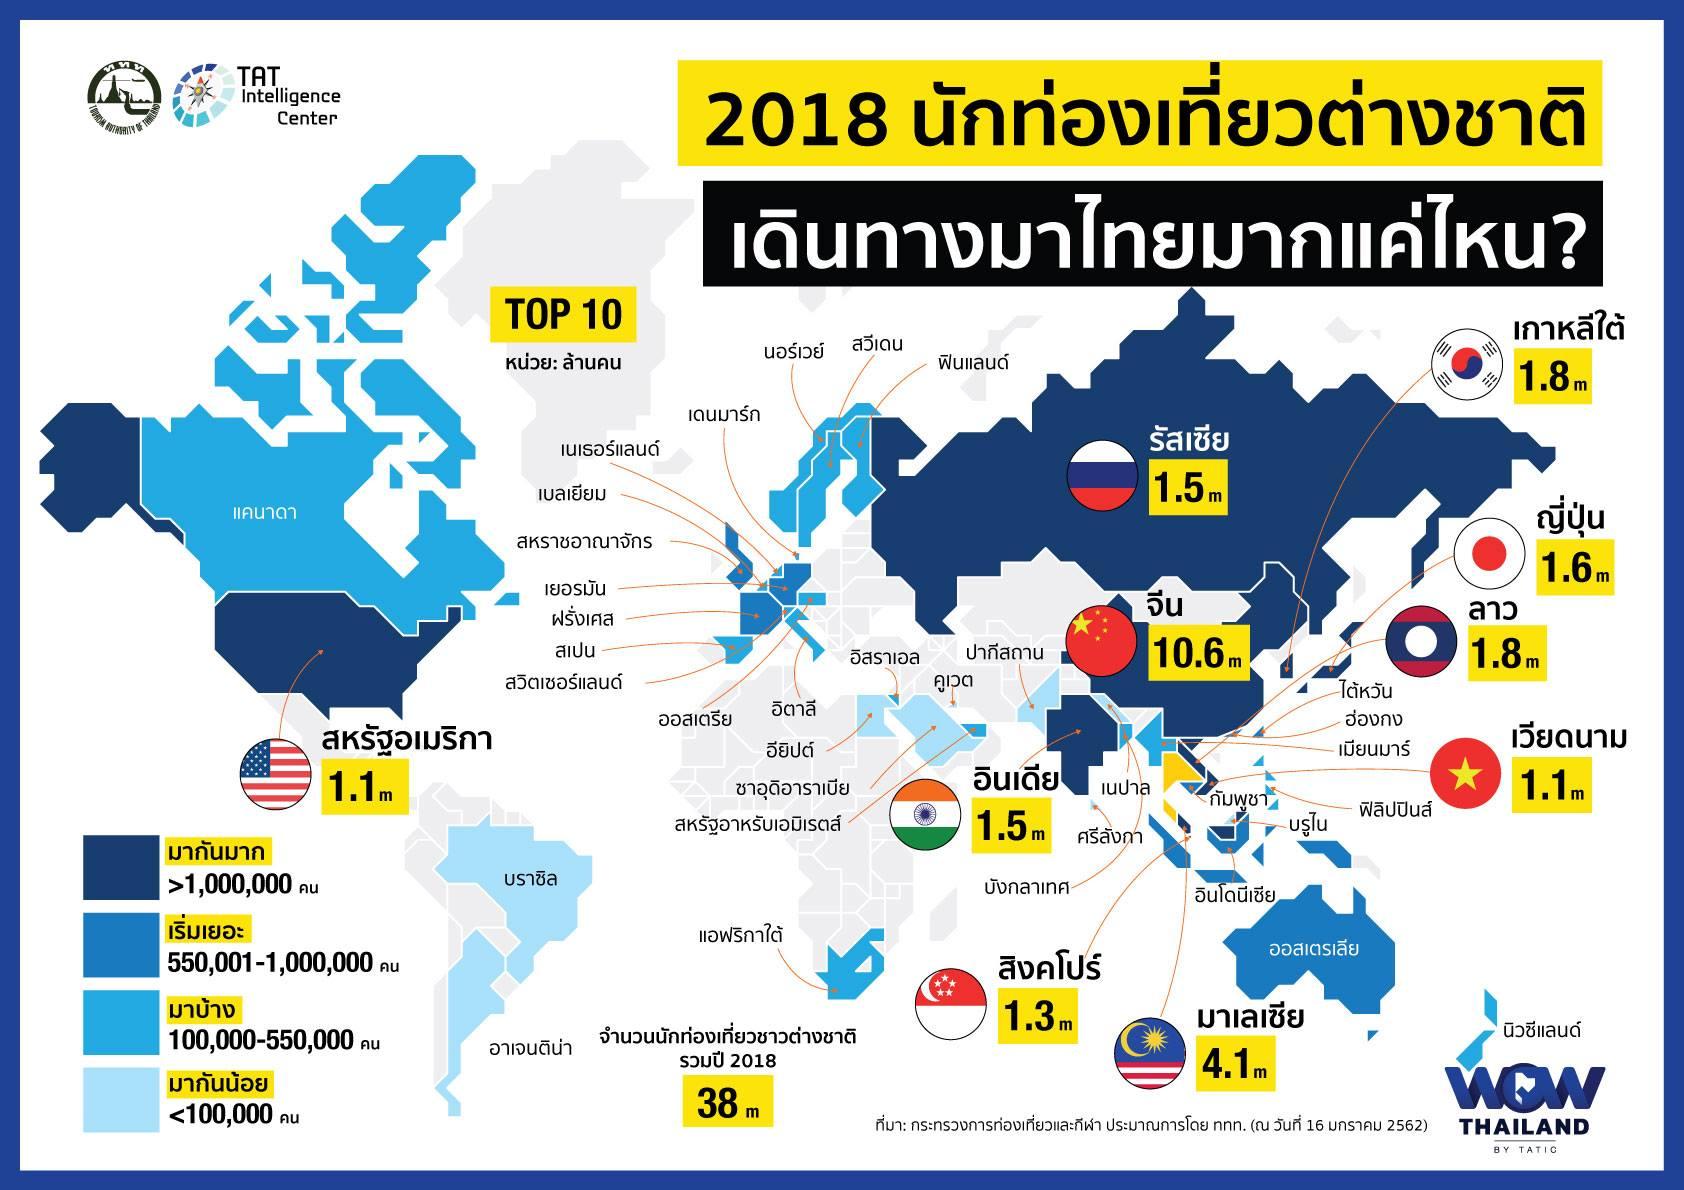 Thailand Tourism Highlights for 2018 – Tourism